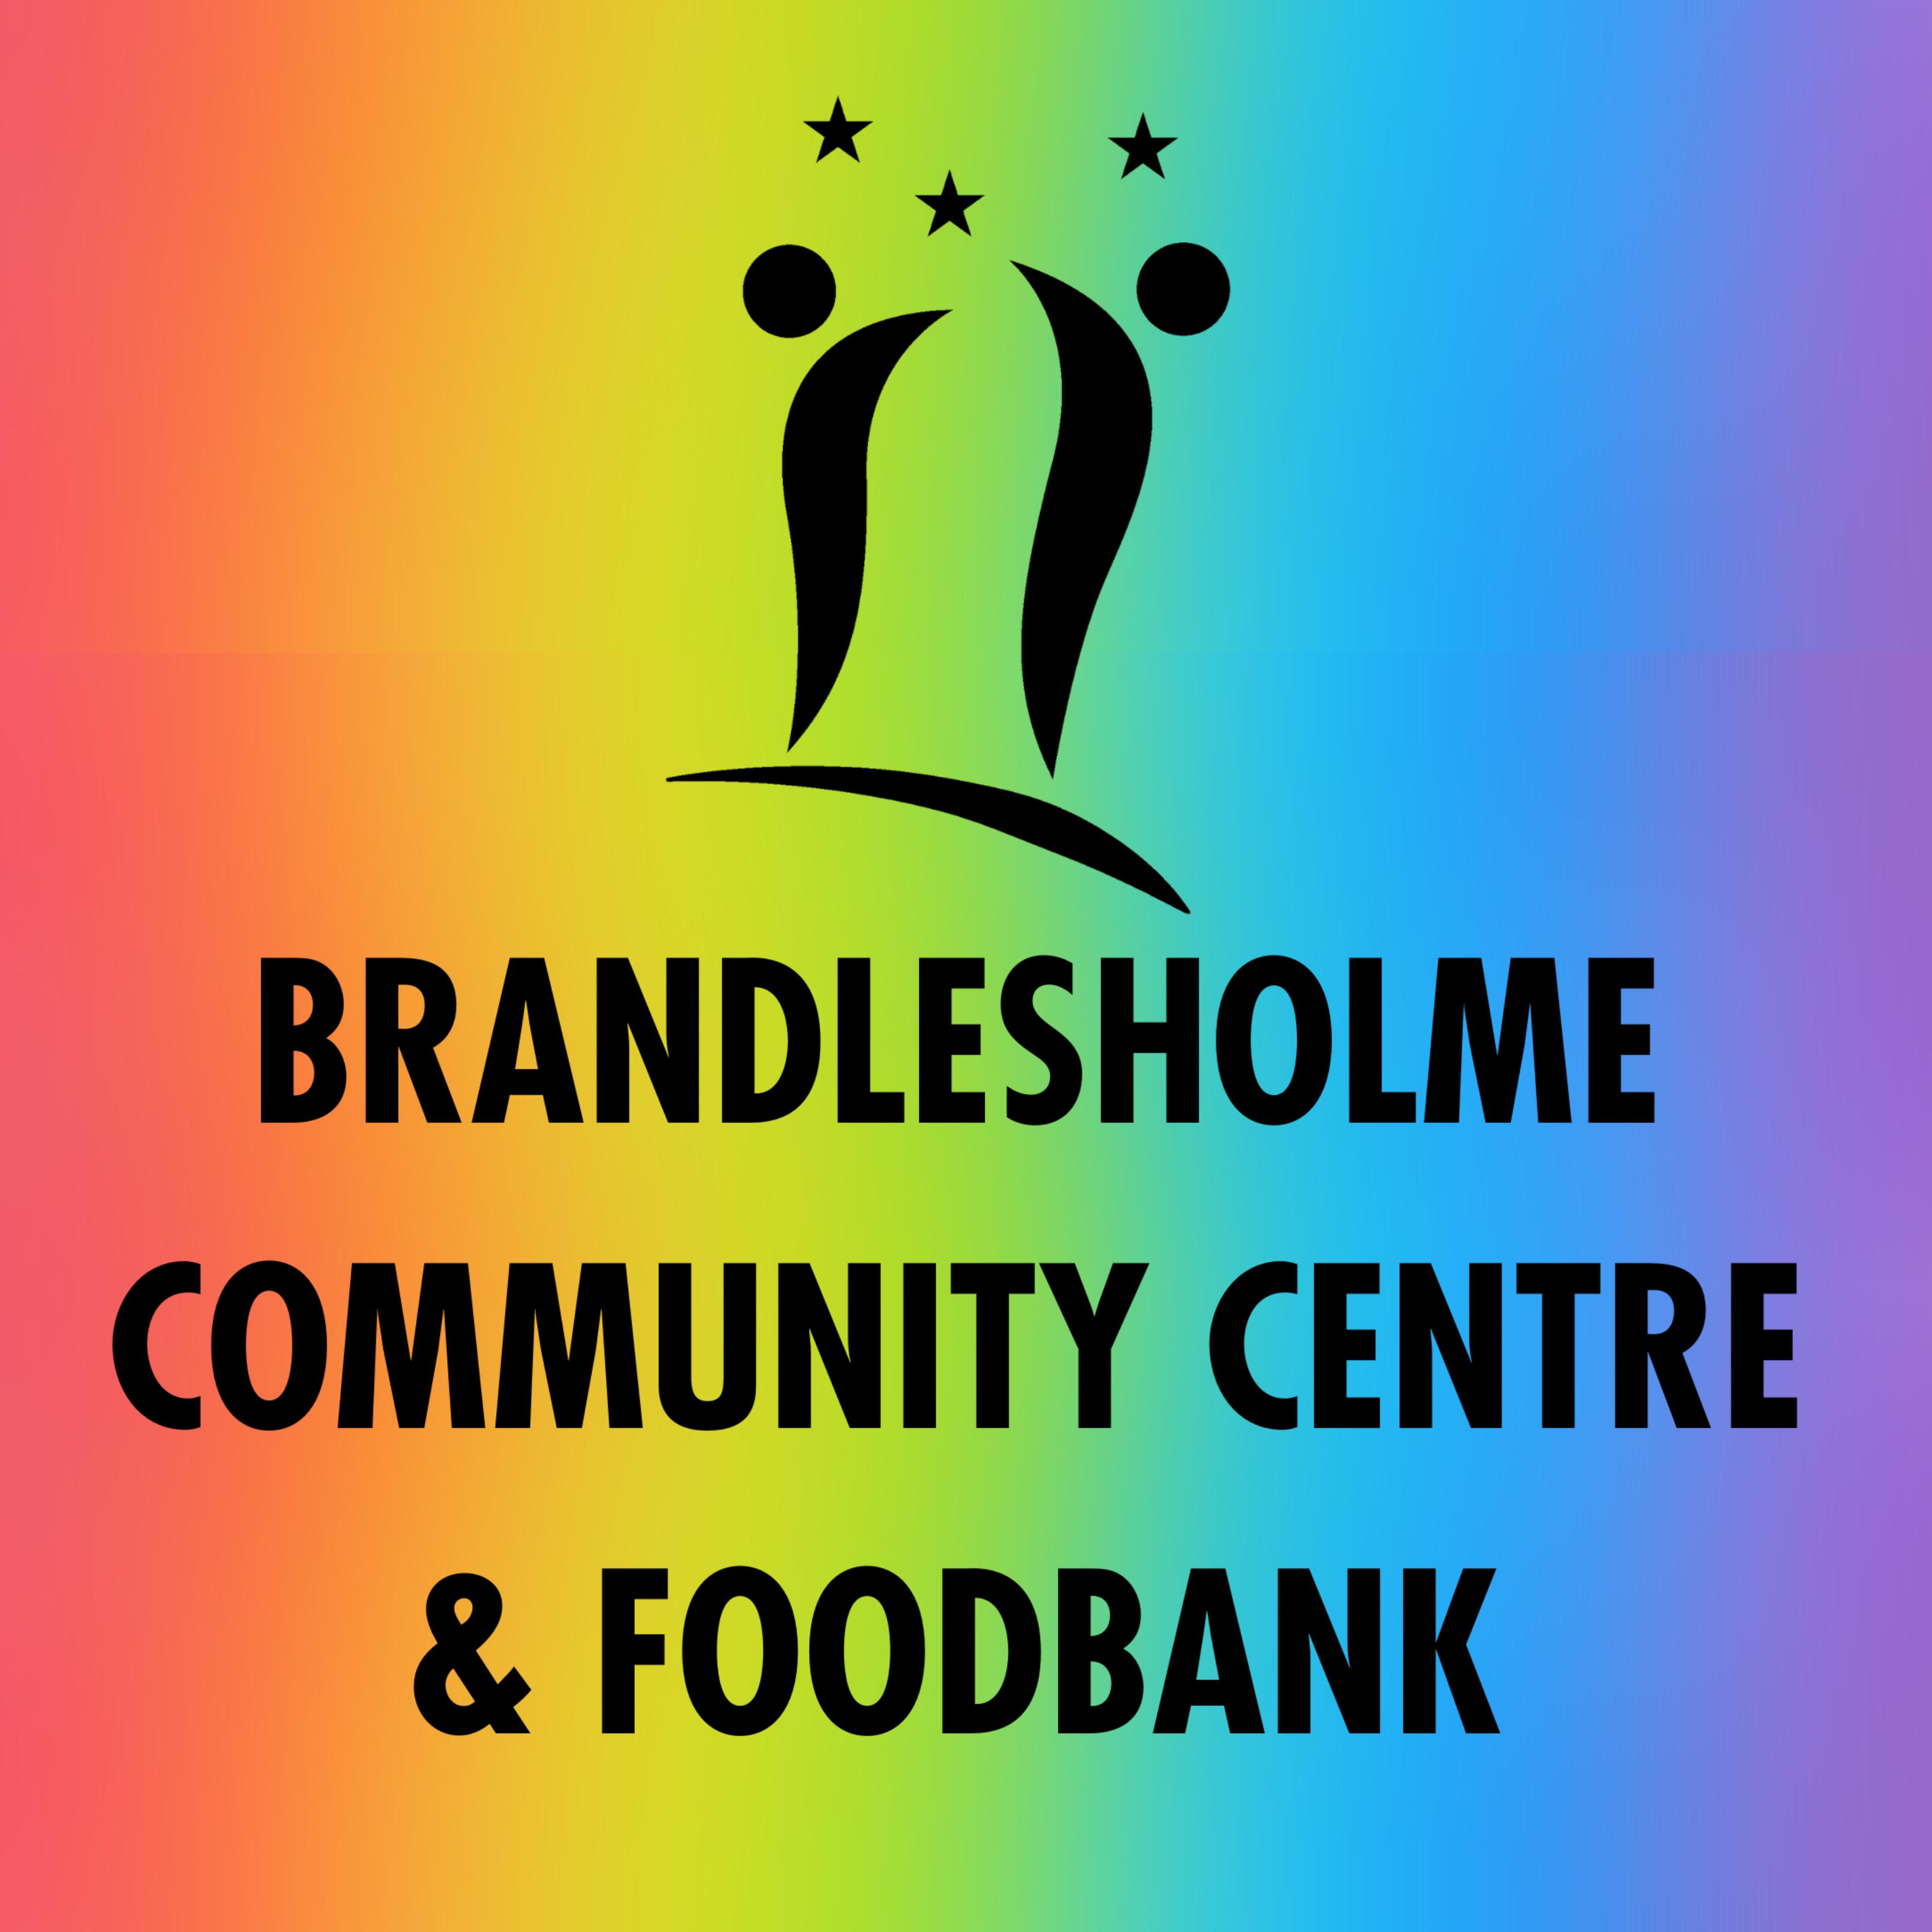 Brandlesholme Community Centre